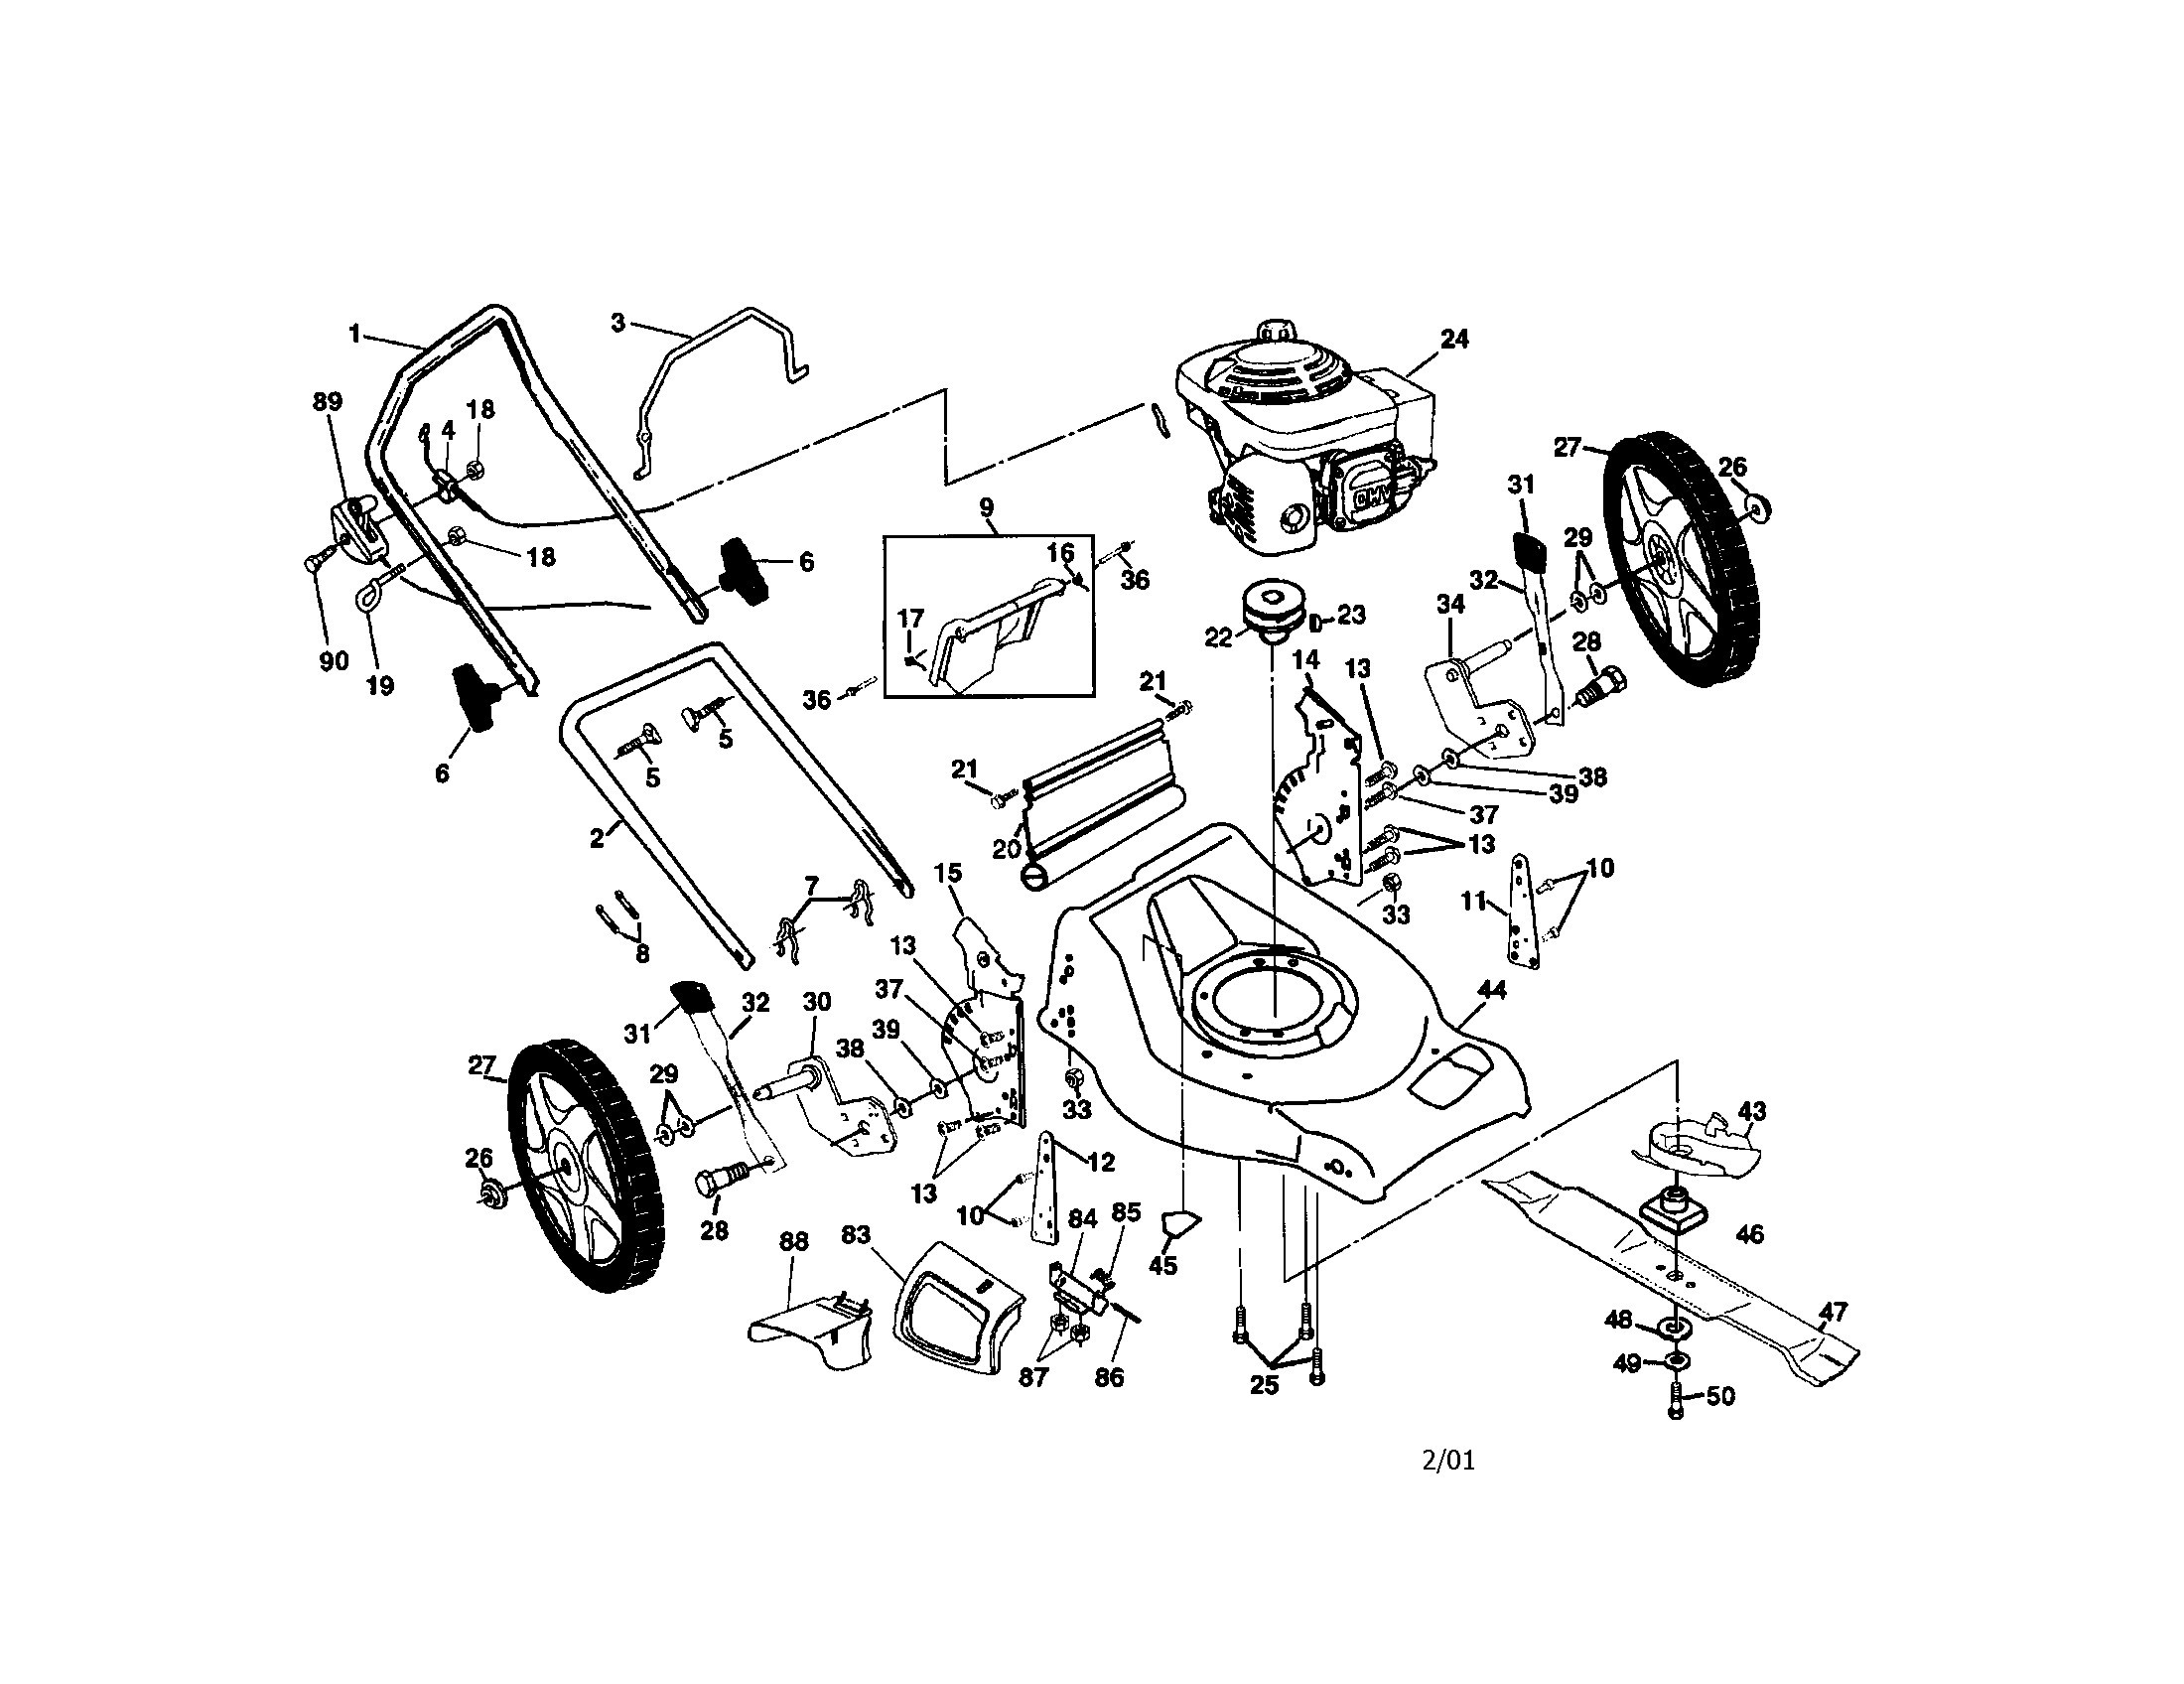 seat leon mk fuse box diagram wiring liry f schematics